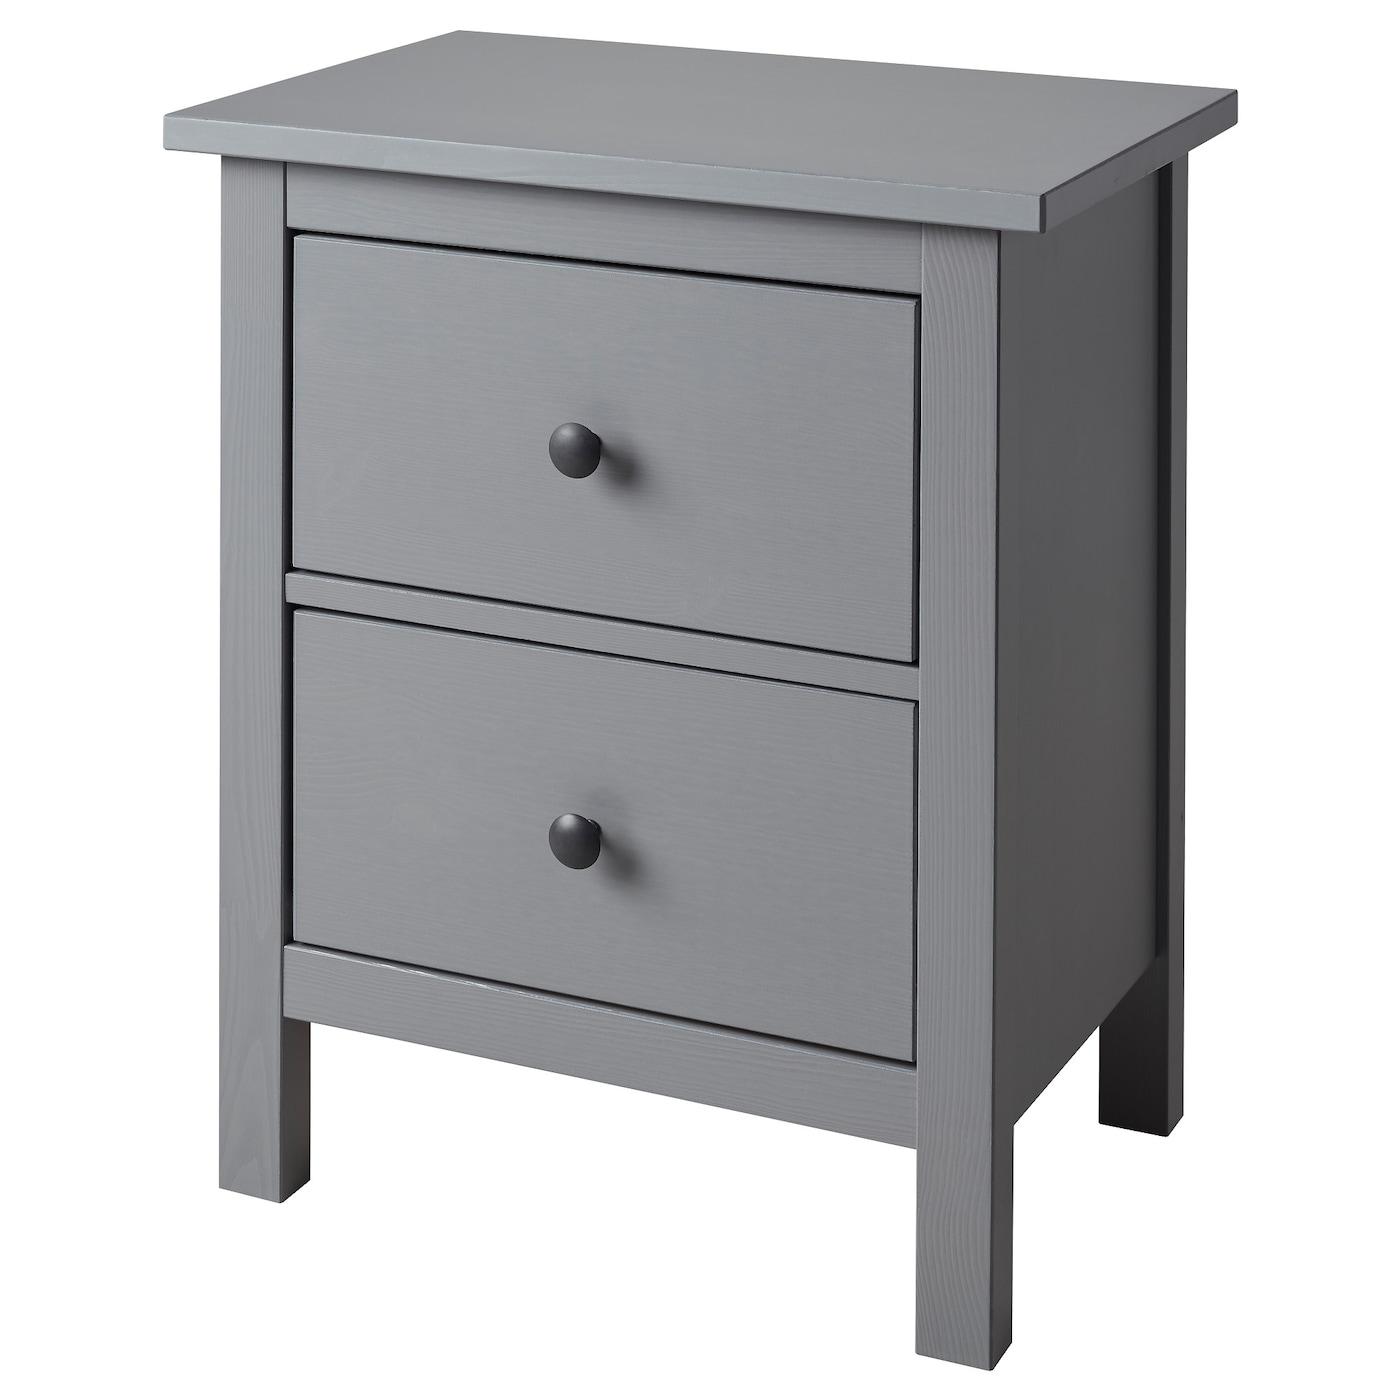 IKEA - HEMNES Ladekast 2 lades - 54x66 cm - Grijs gelazuurd